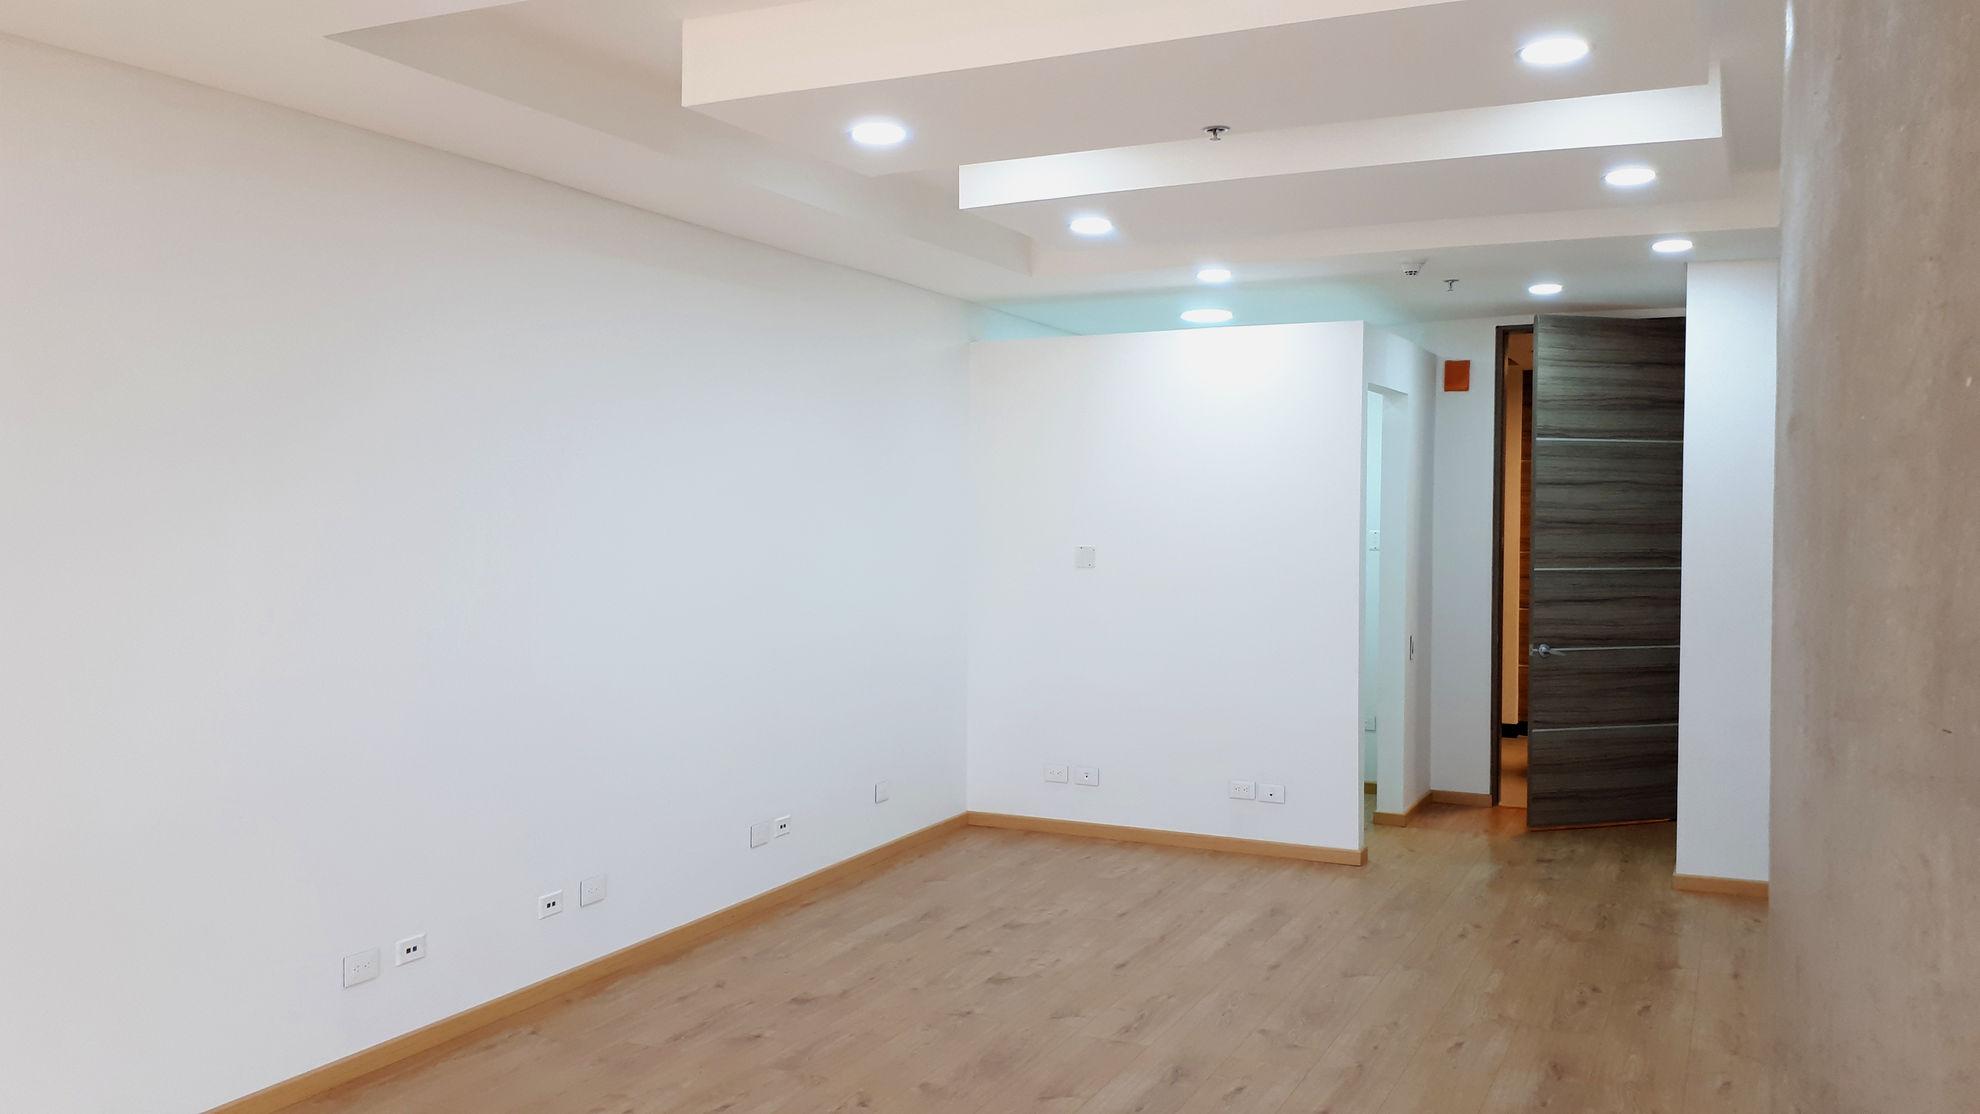 Oficina en Guanoa, Bogotá 5687, foto 15